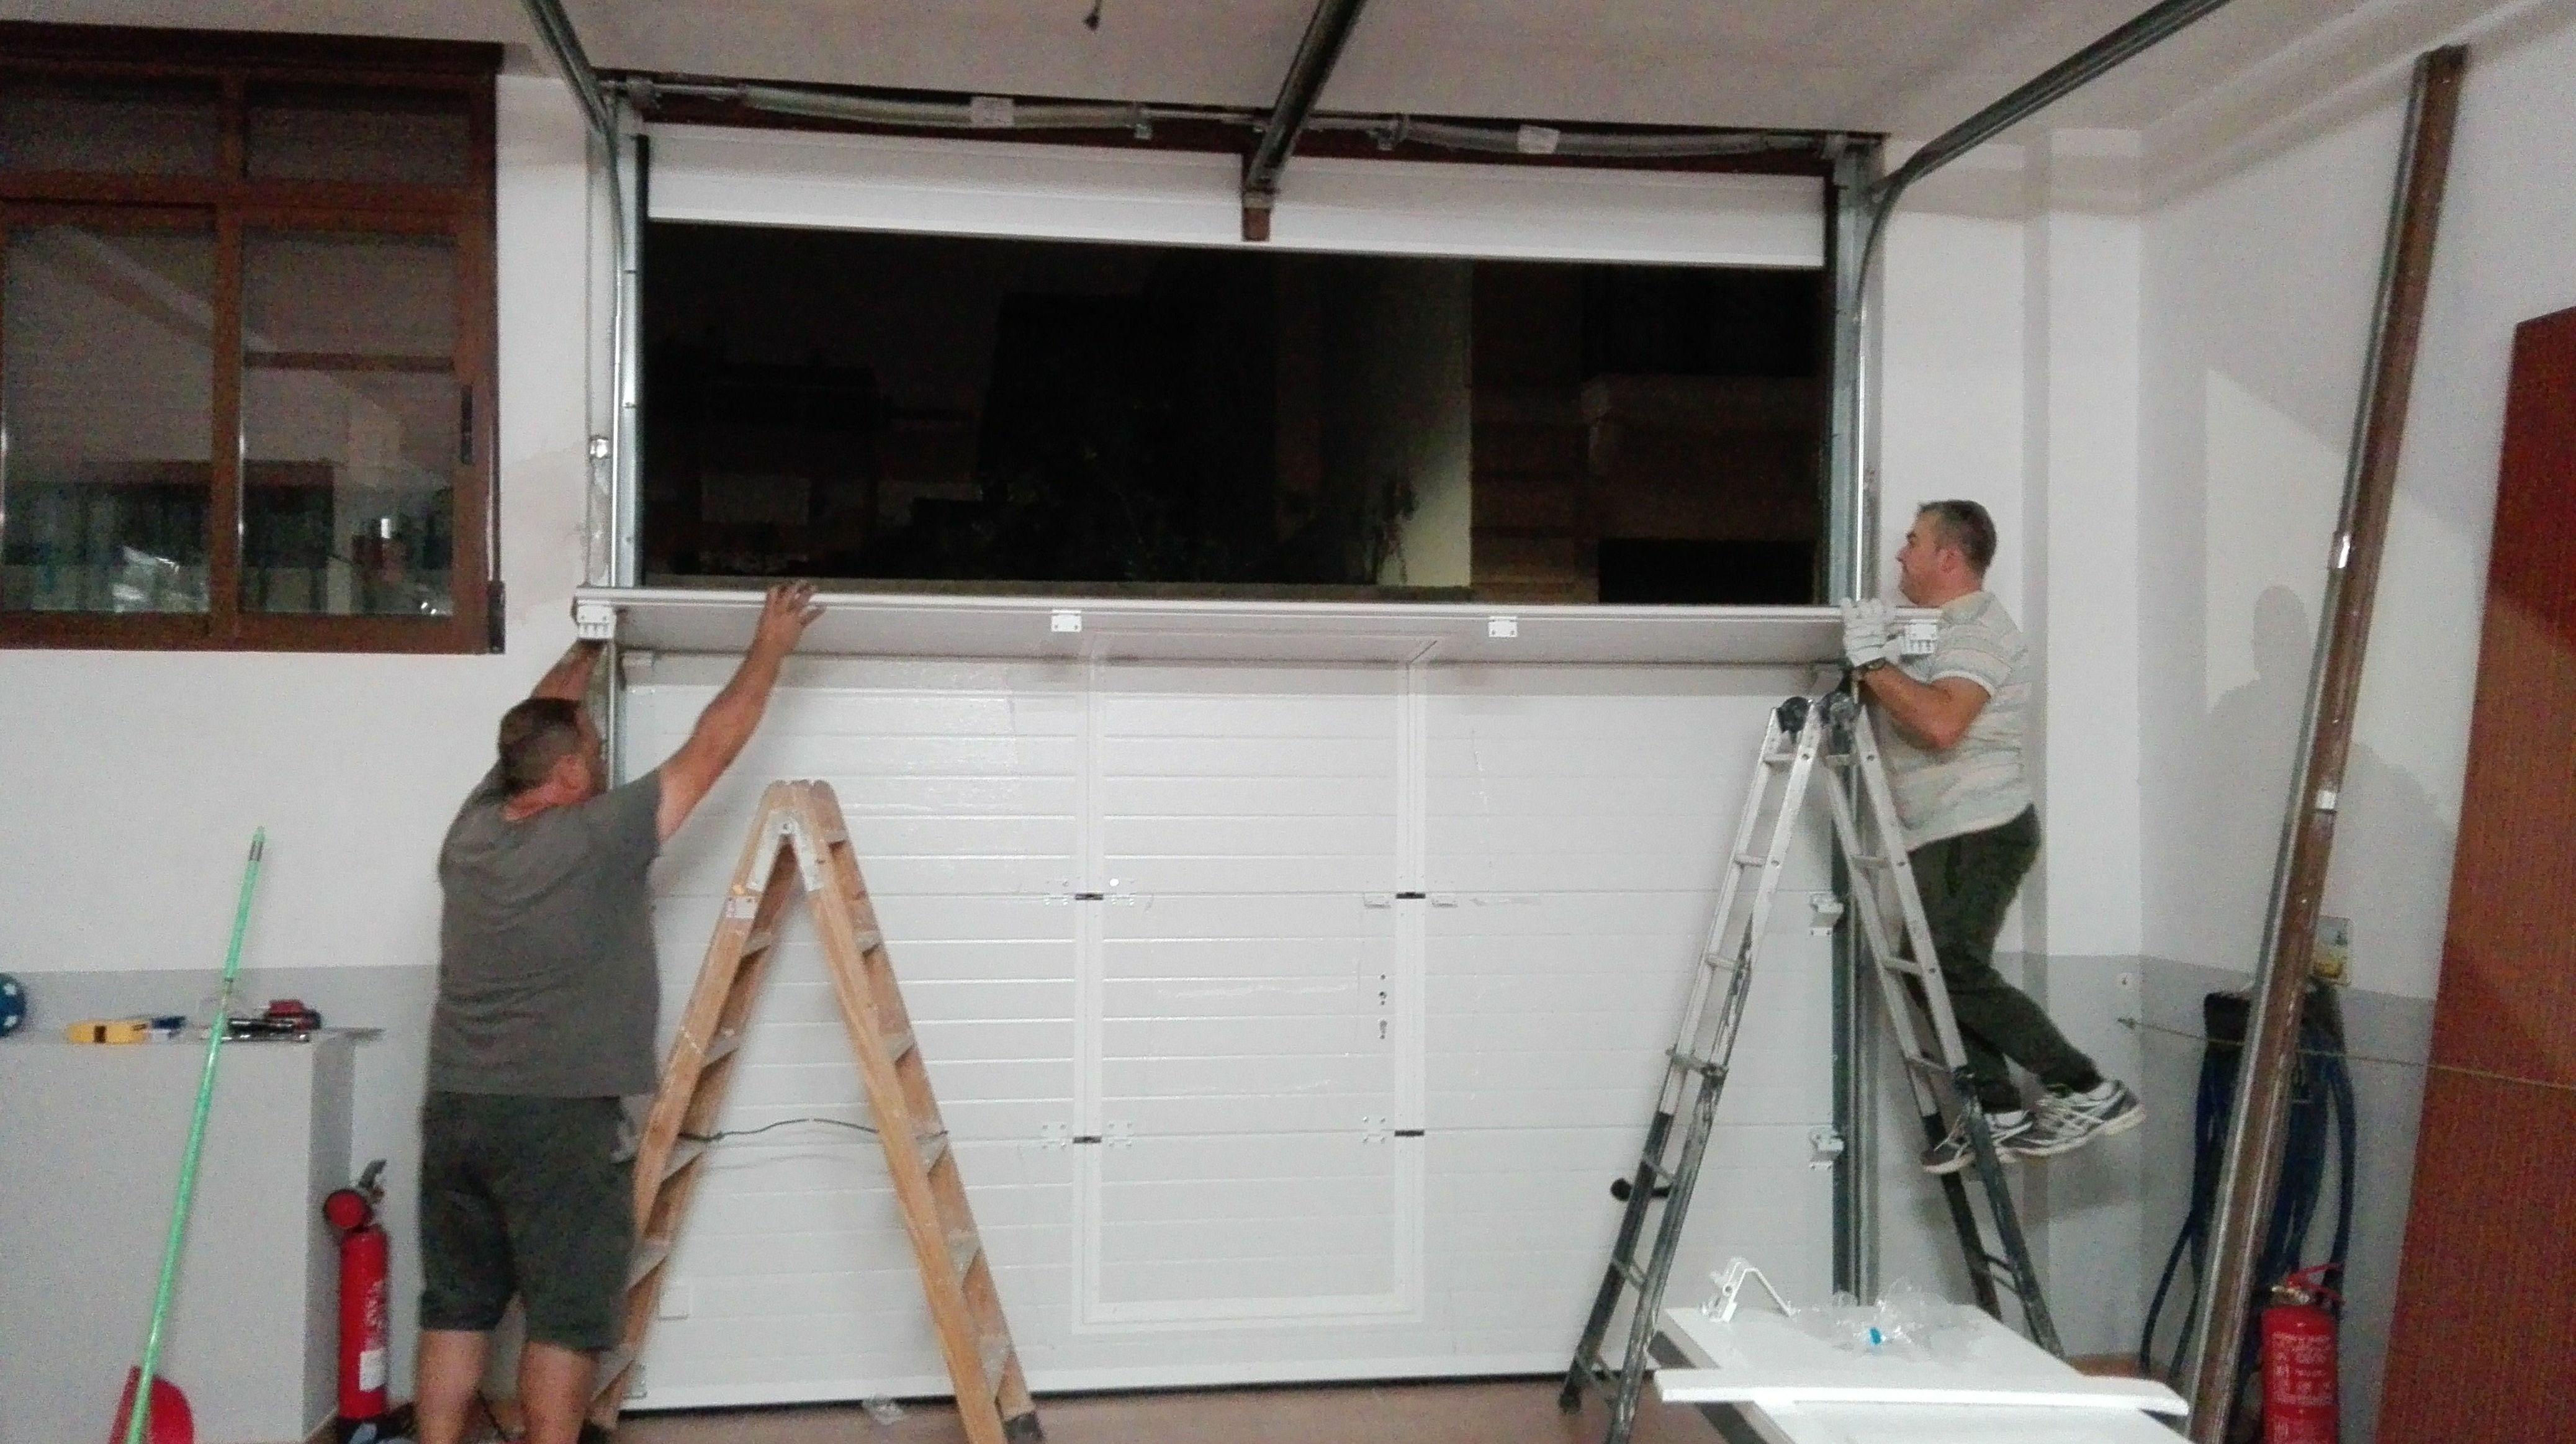 Montaje de paneles de puerta seccional con puerta peatonal inscrita (incorporada)